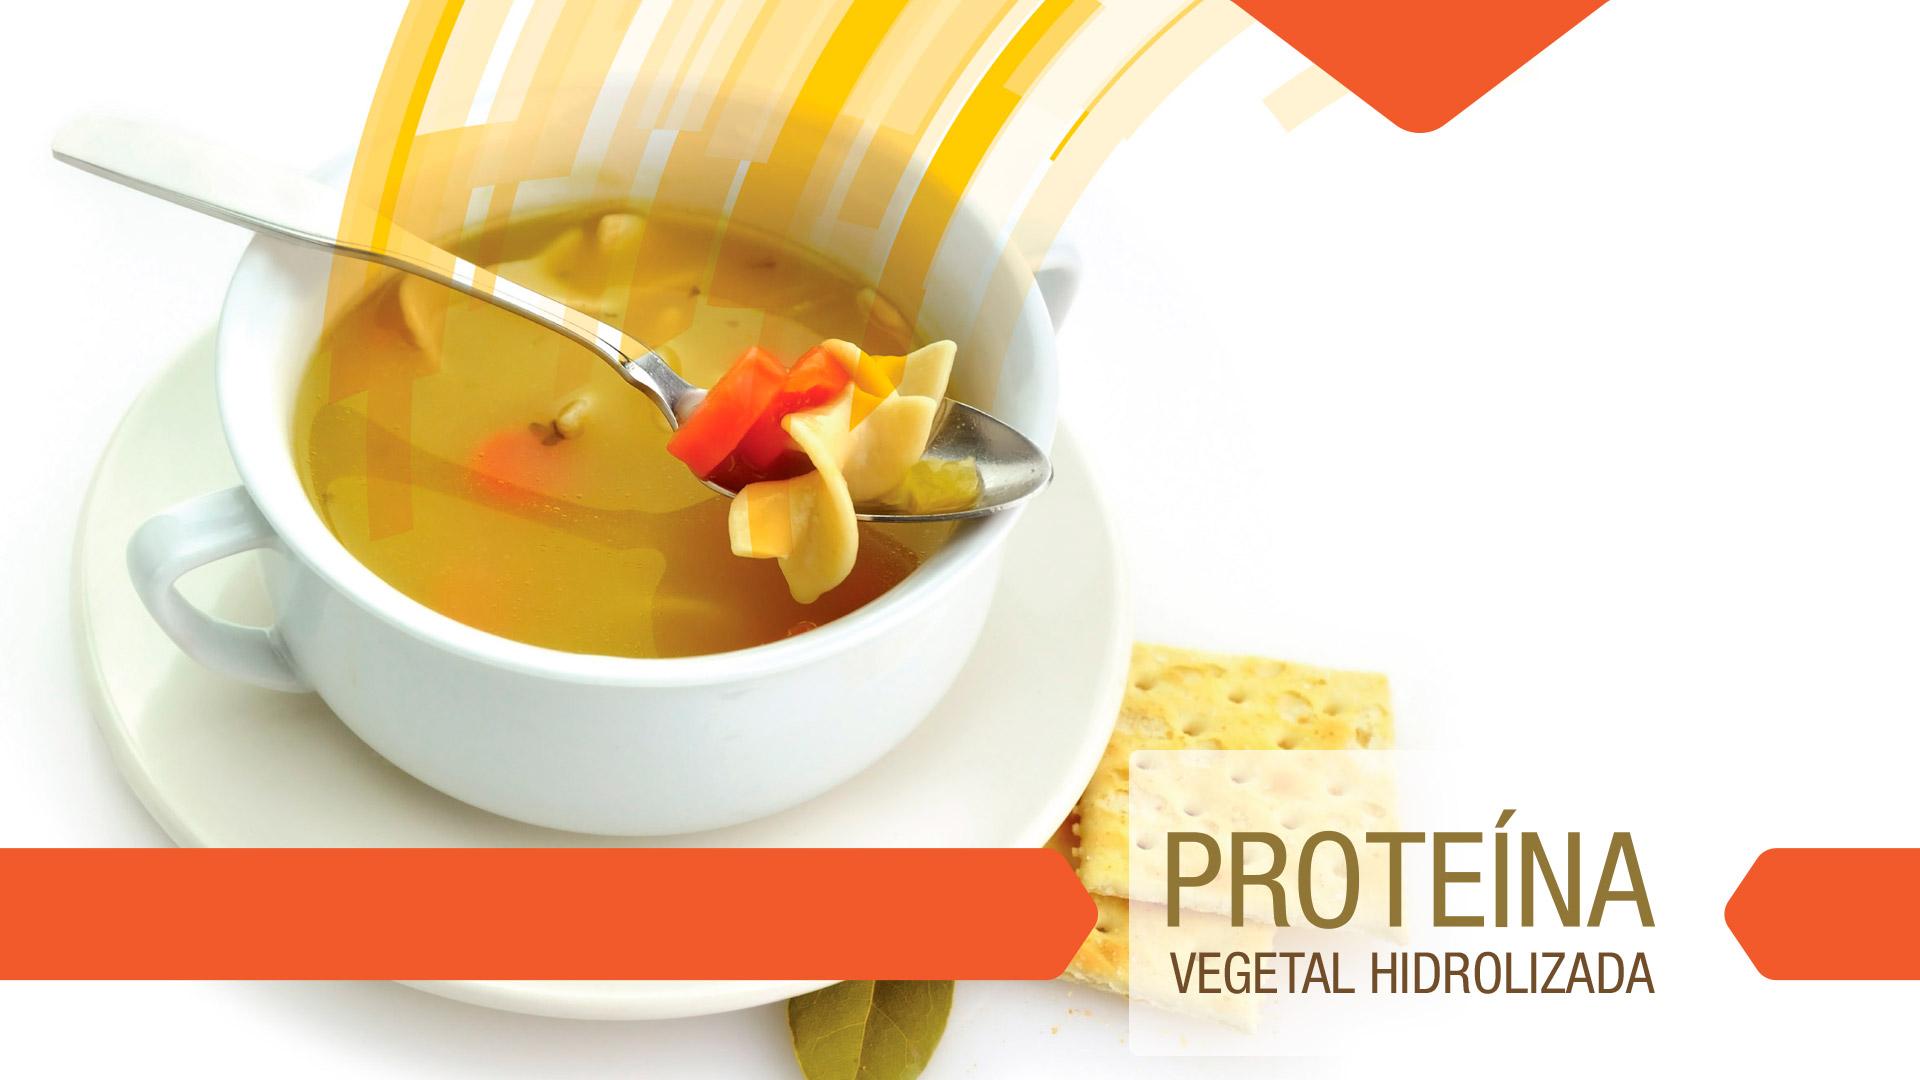 Proteína vegetal hidrolizada